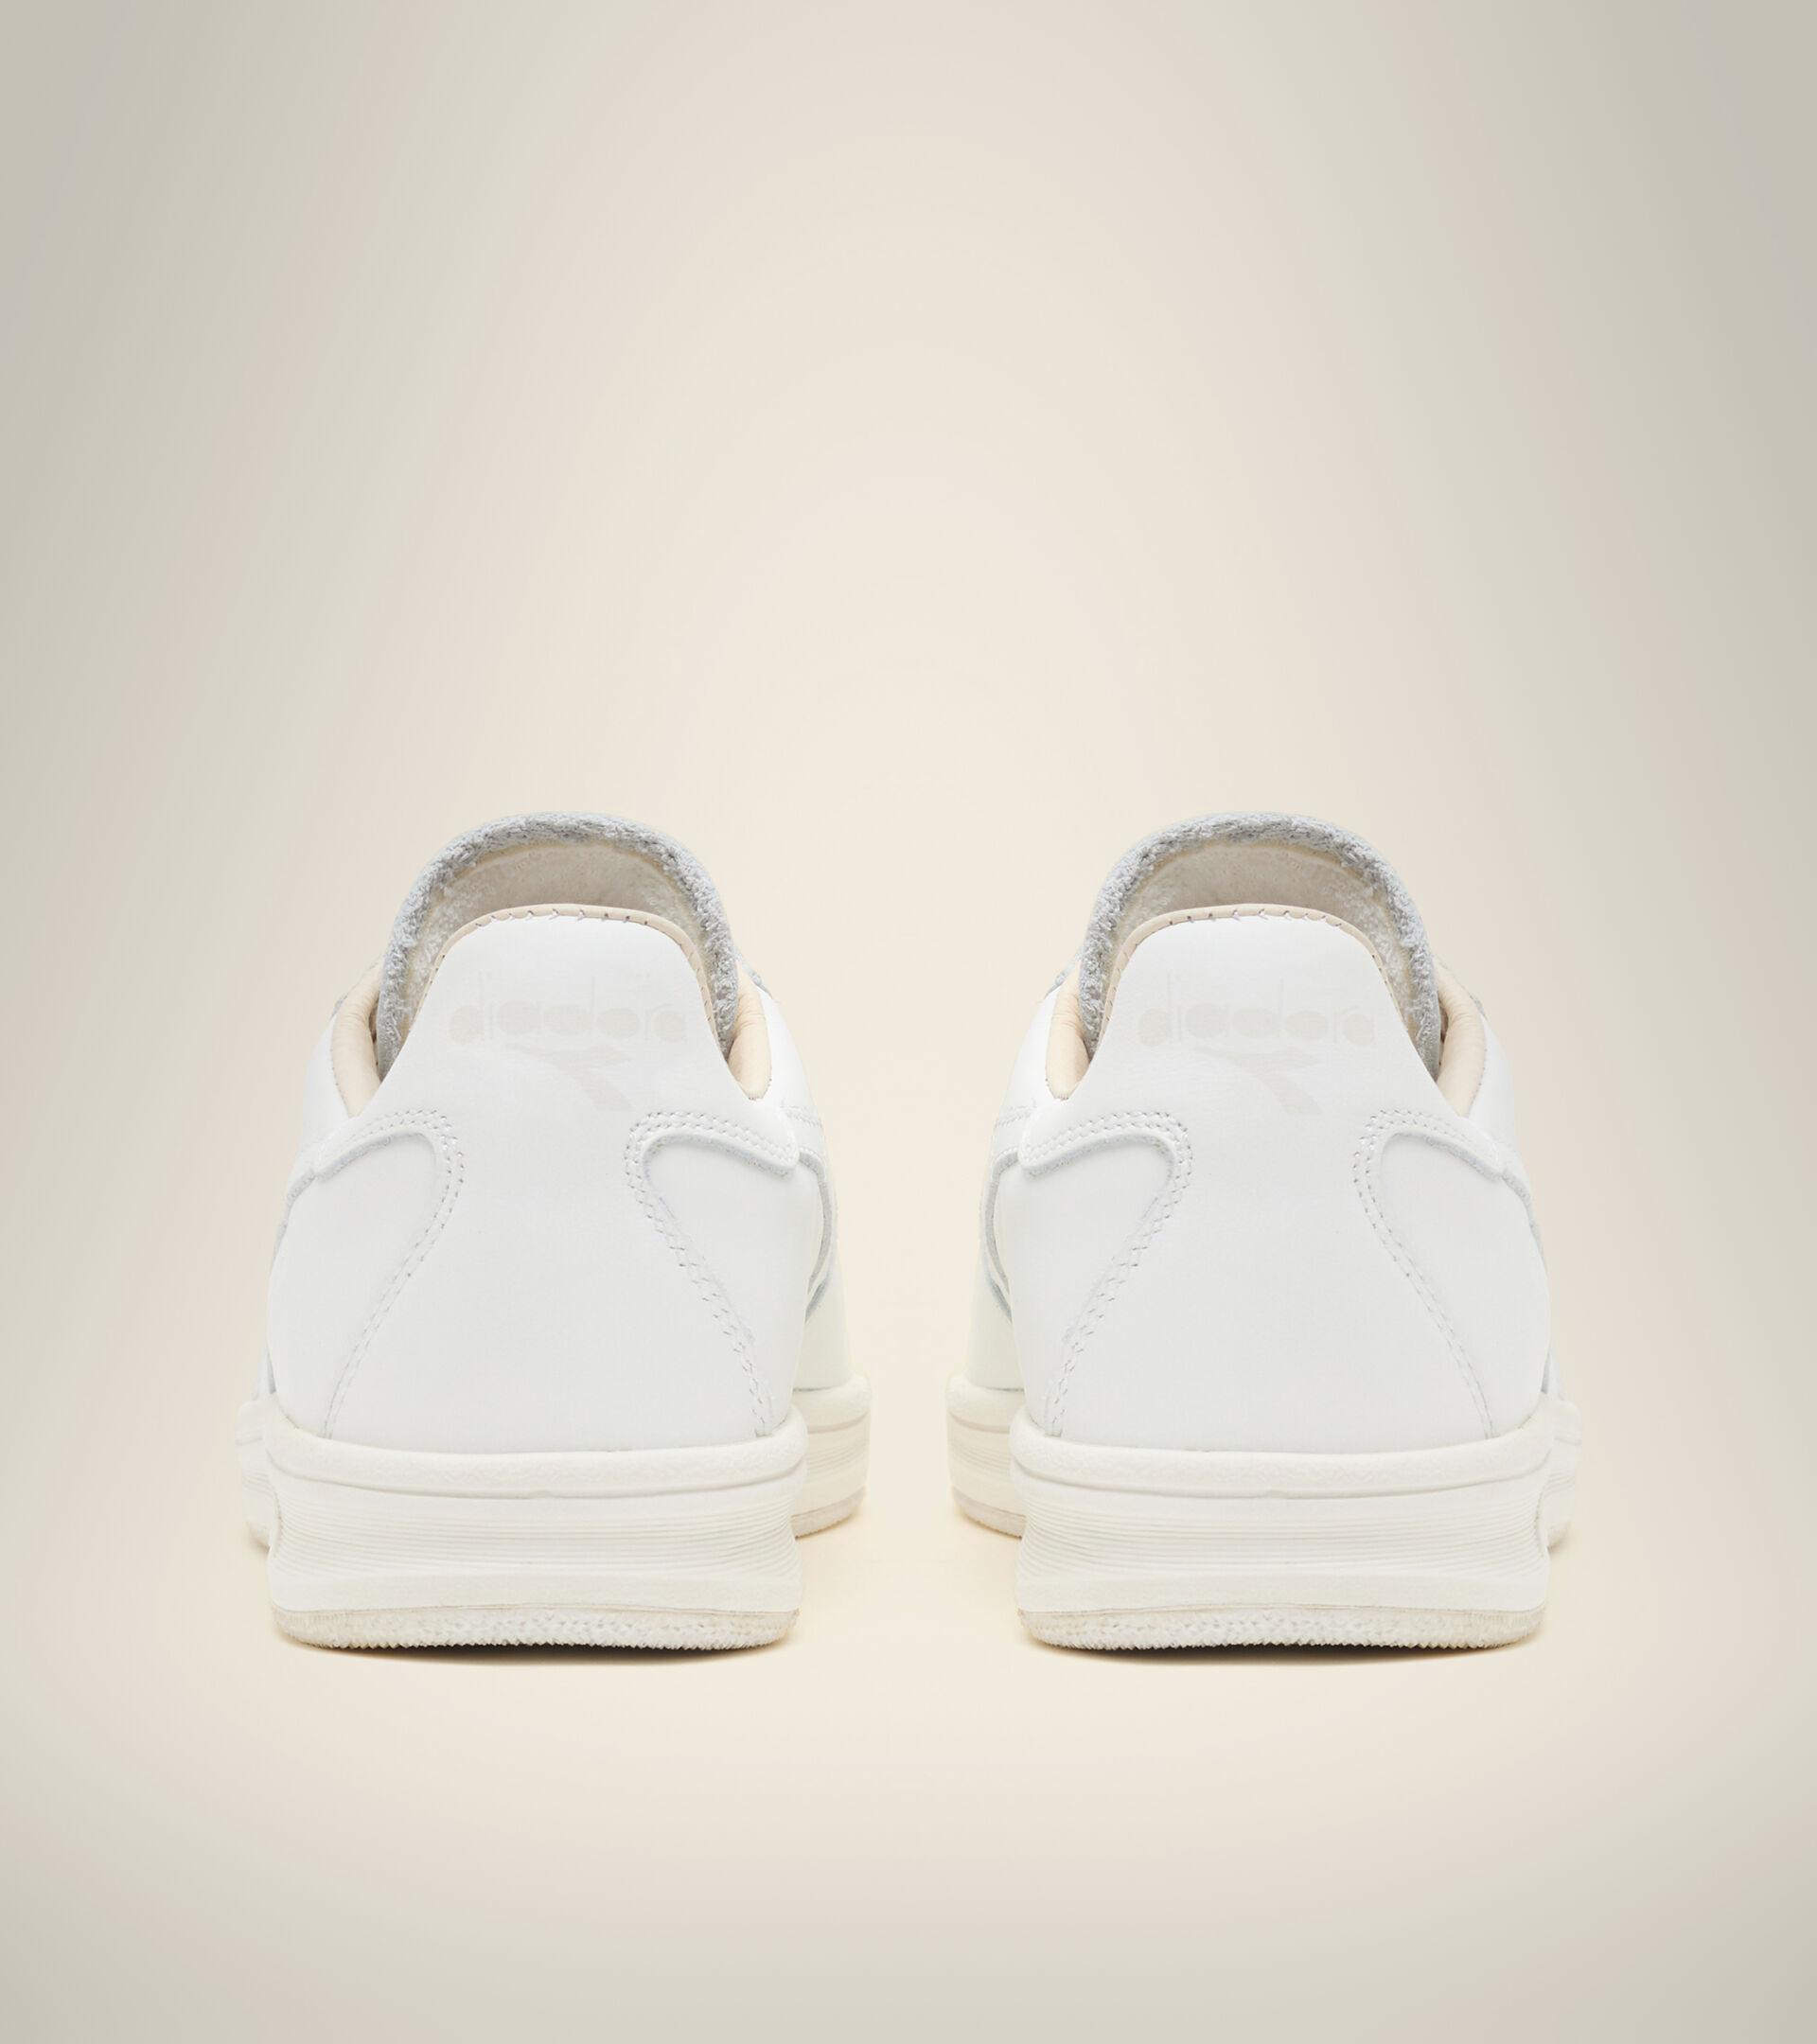 Footwear Heritage UNISEX B.ELITE H ITALIA SPORT BIANCO/BIANCO Diadora